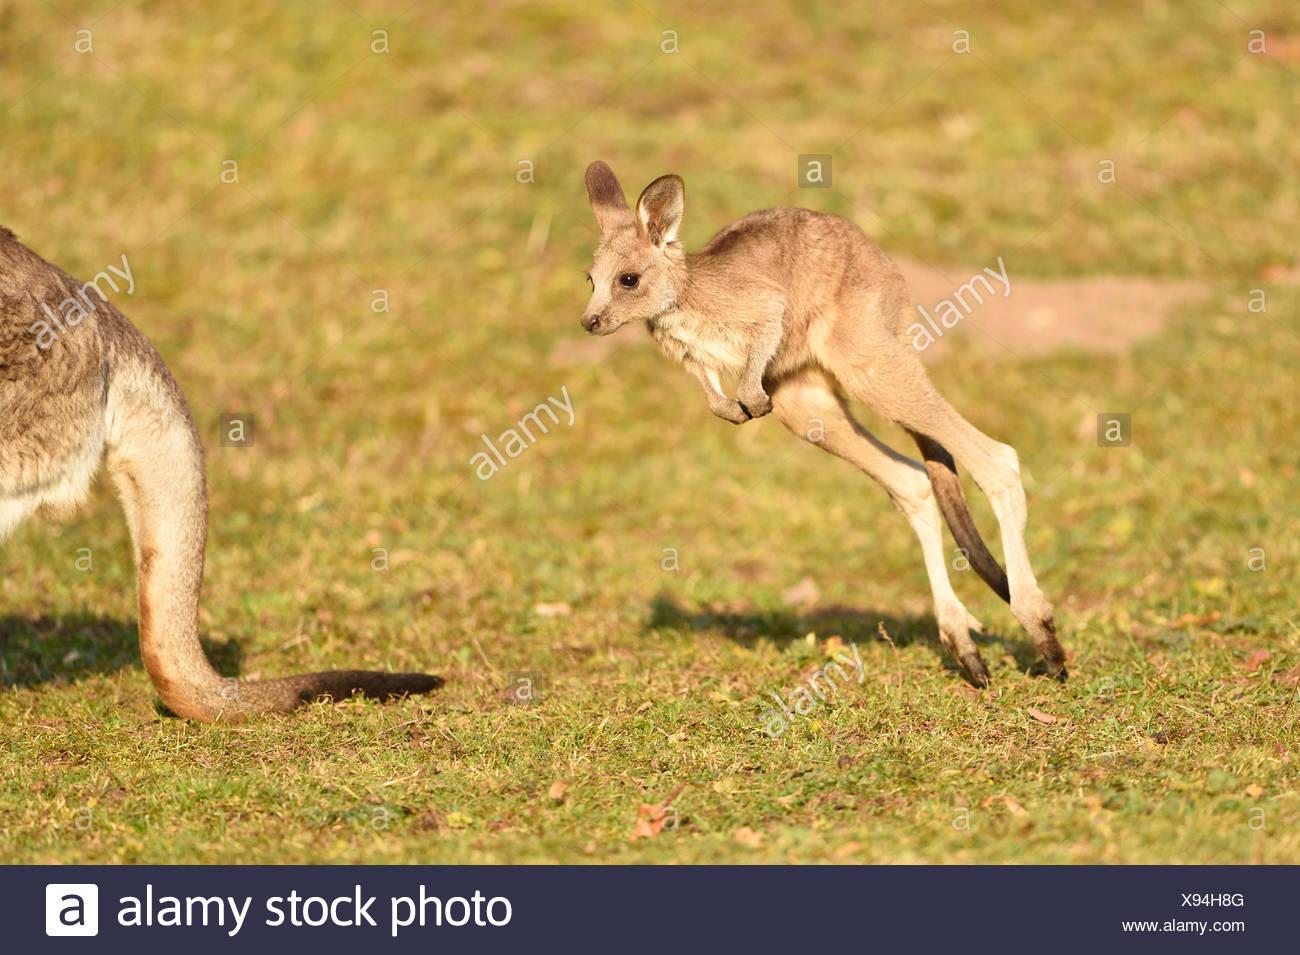 eastern gray kangaroo (Macropus giganteus), cub on a meadow - Stock Image